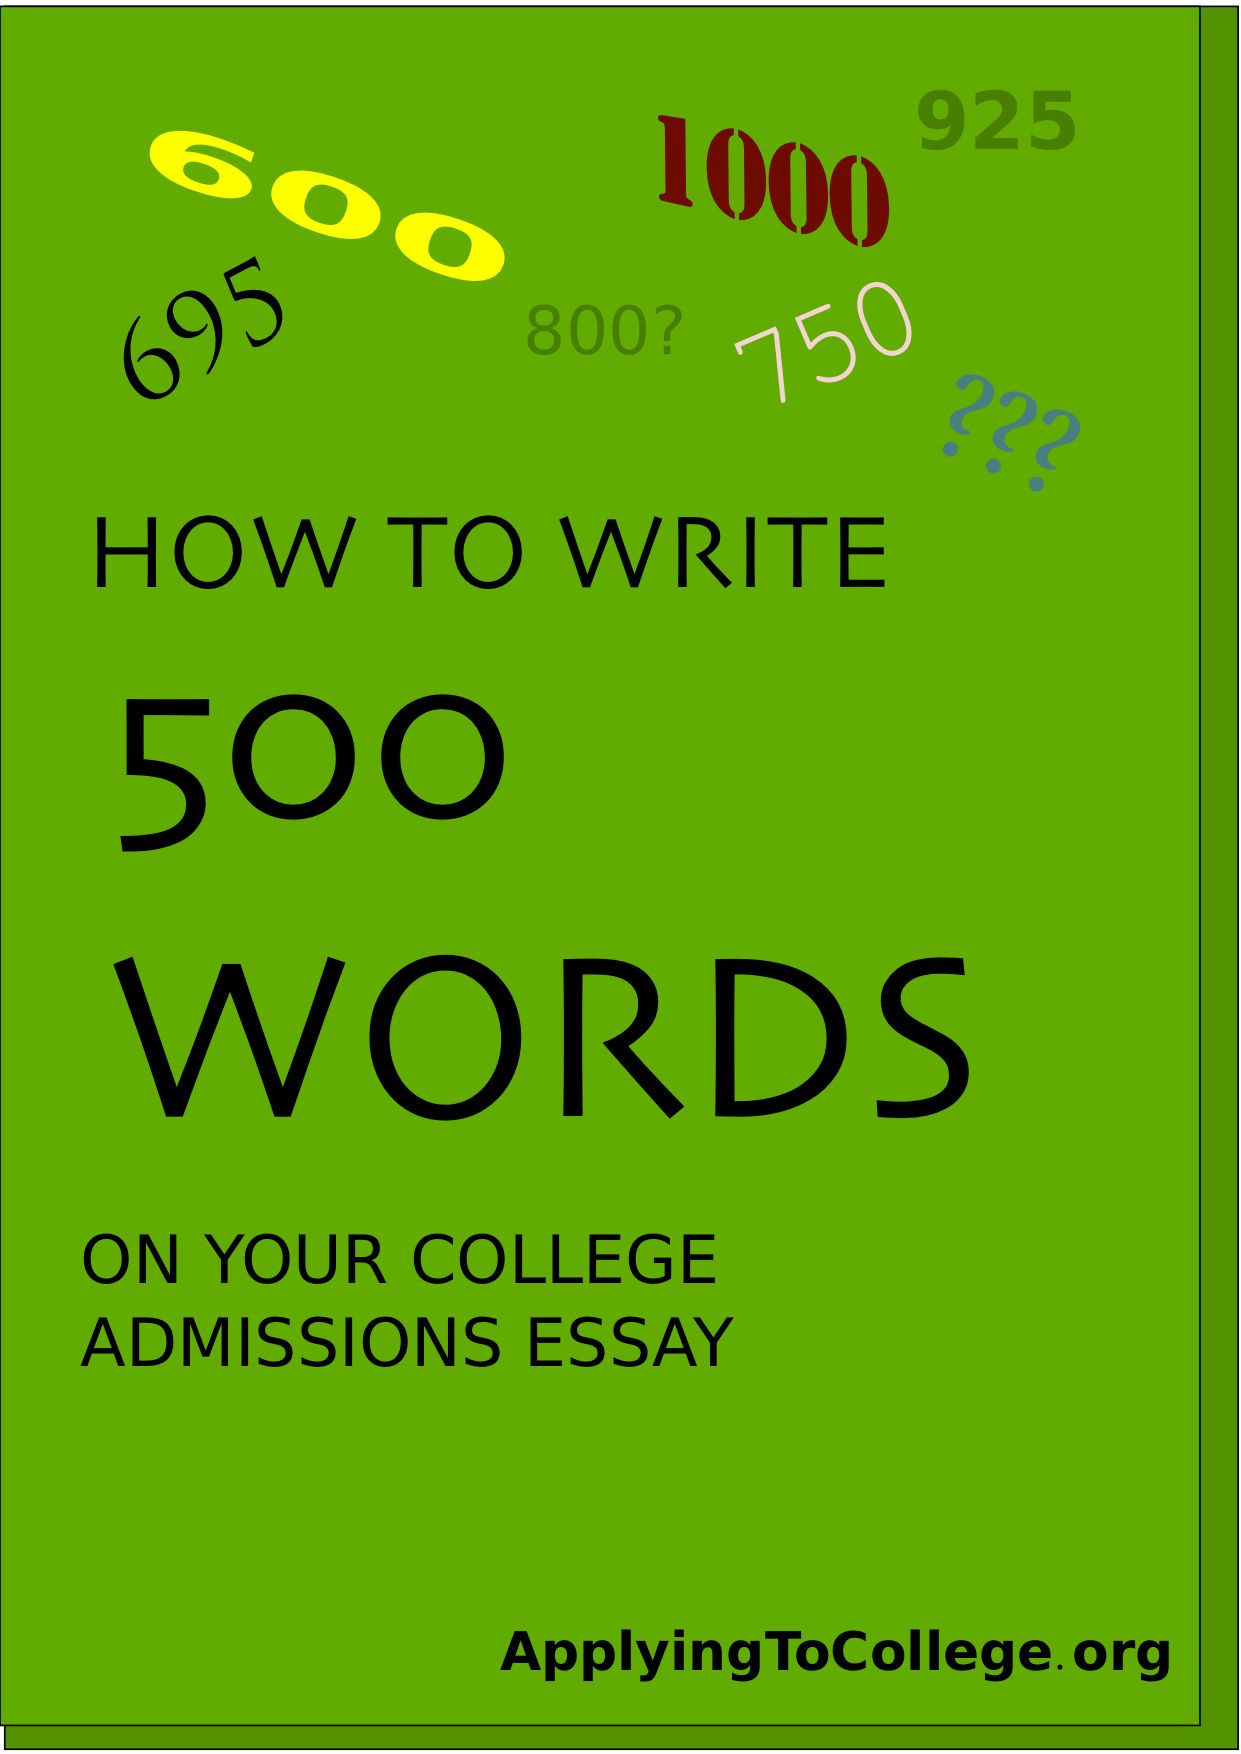 005 Essay Example College Word Impressive Limit Apply Texas 2019 Full